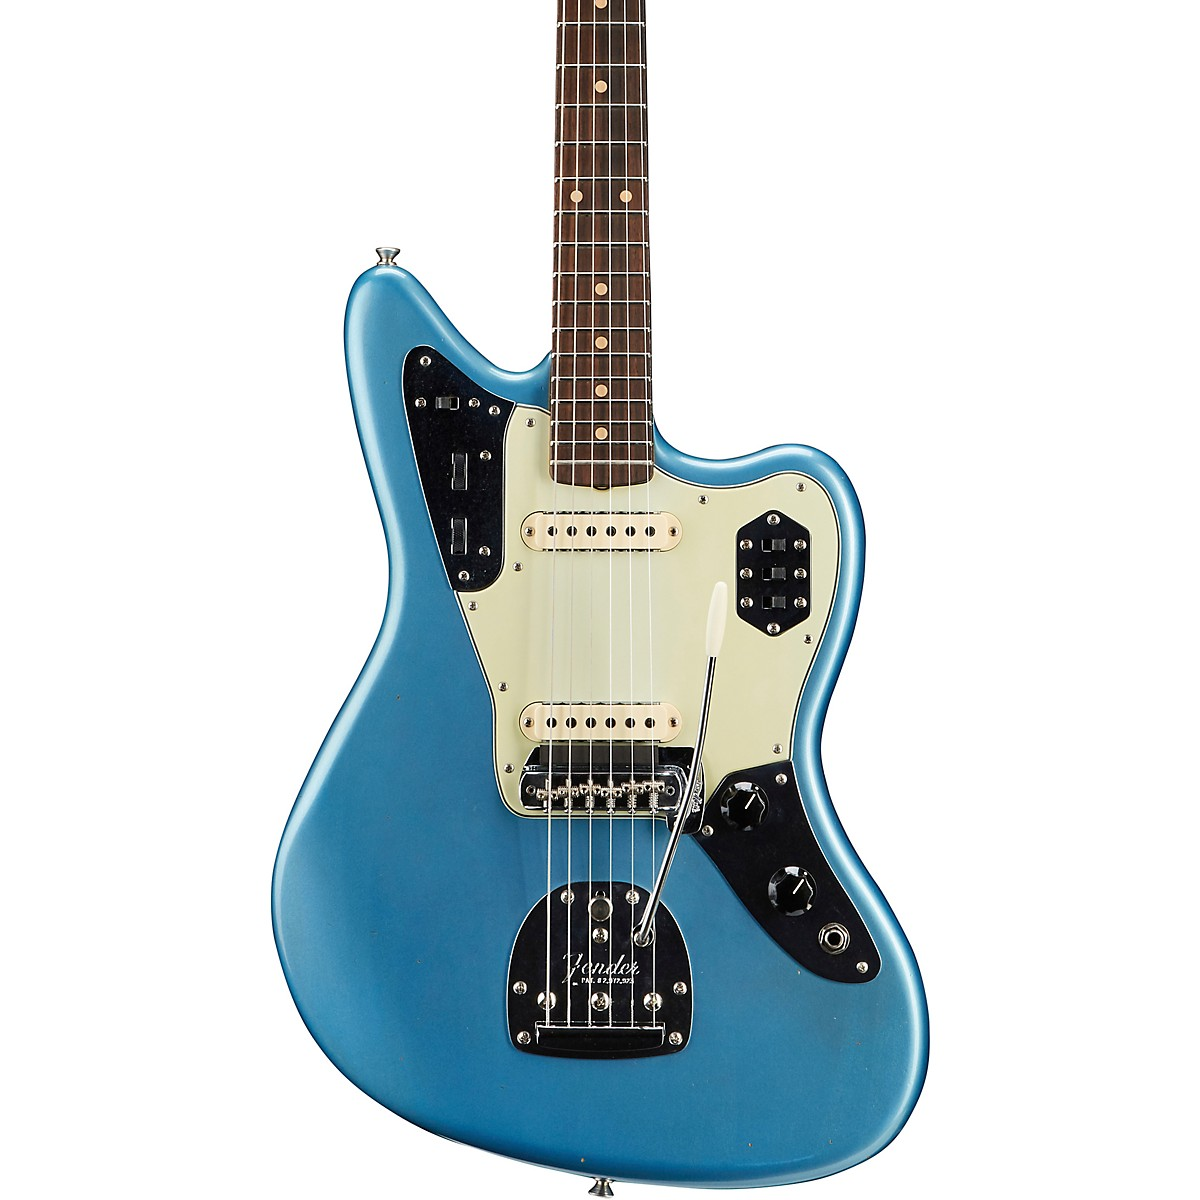 Fender Custom Shop 1962 Jaguar Journeyman Relic with Closet Classic Hardware Electric Guitar